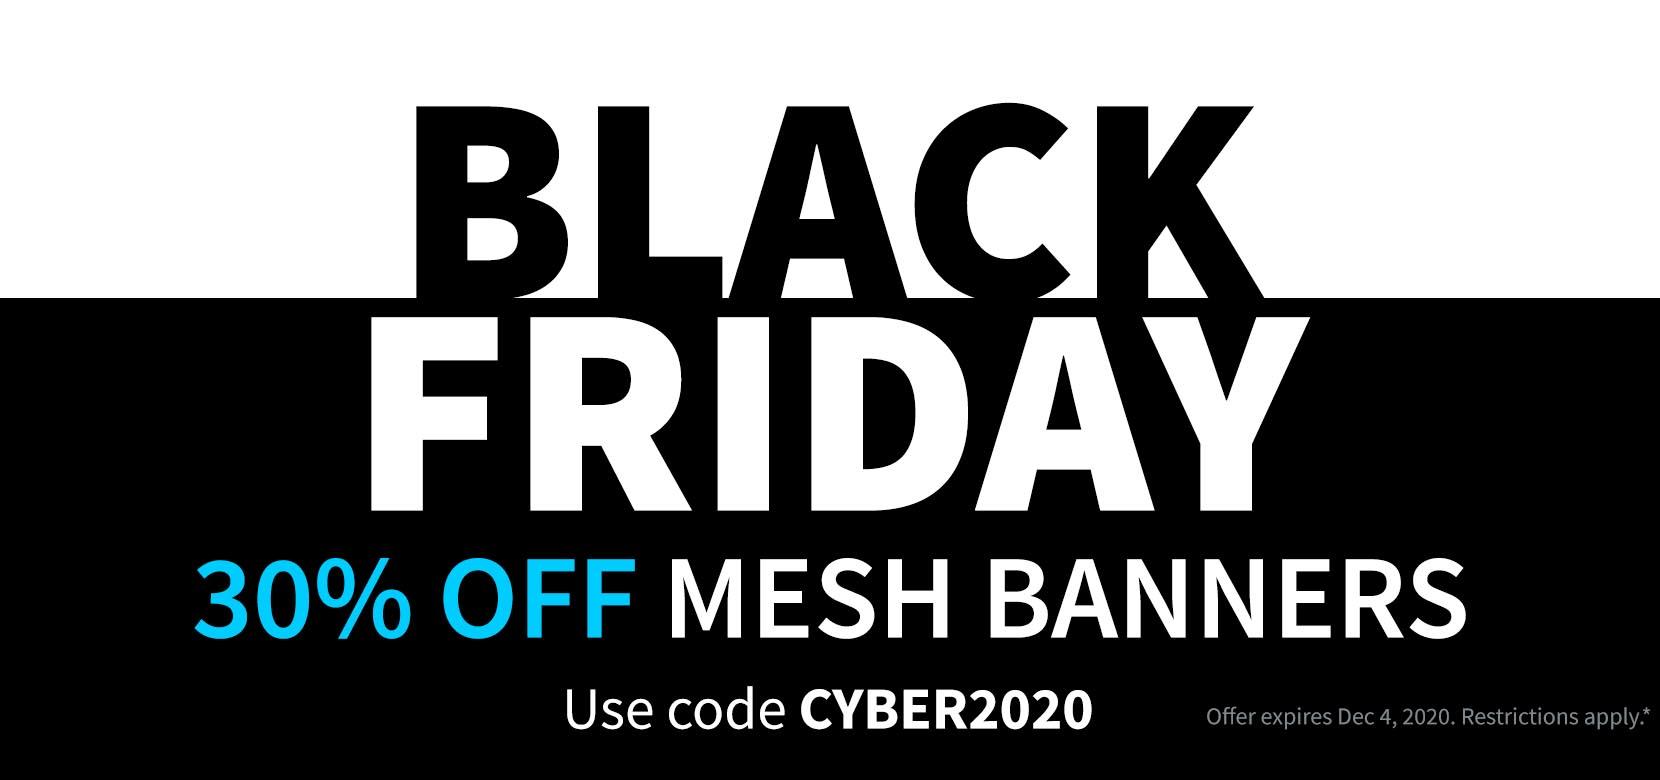 Black Friday CYBER2020 12 Ounce Single Sided Mesh Banner Vinyl